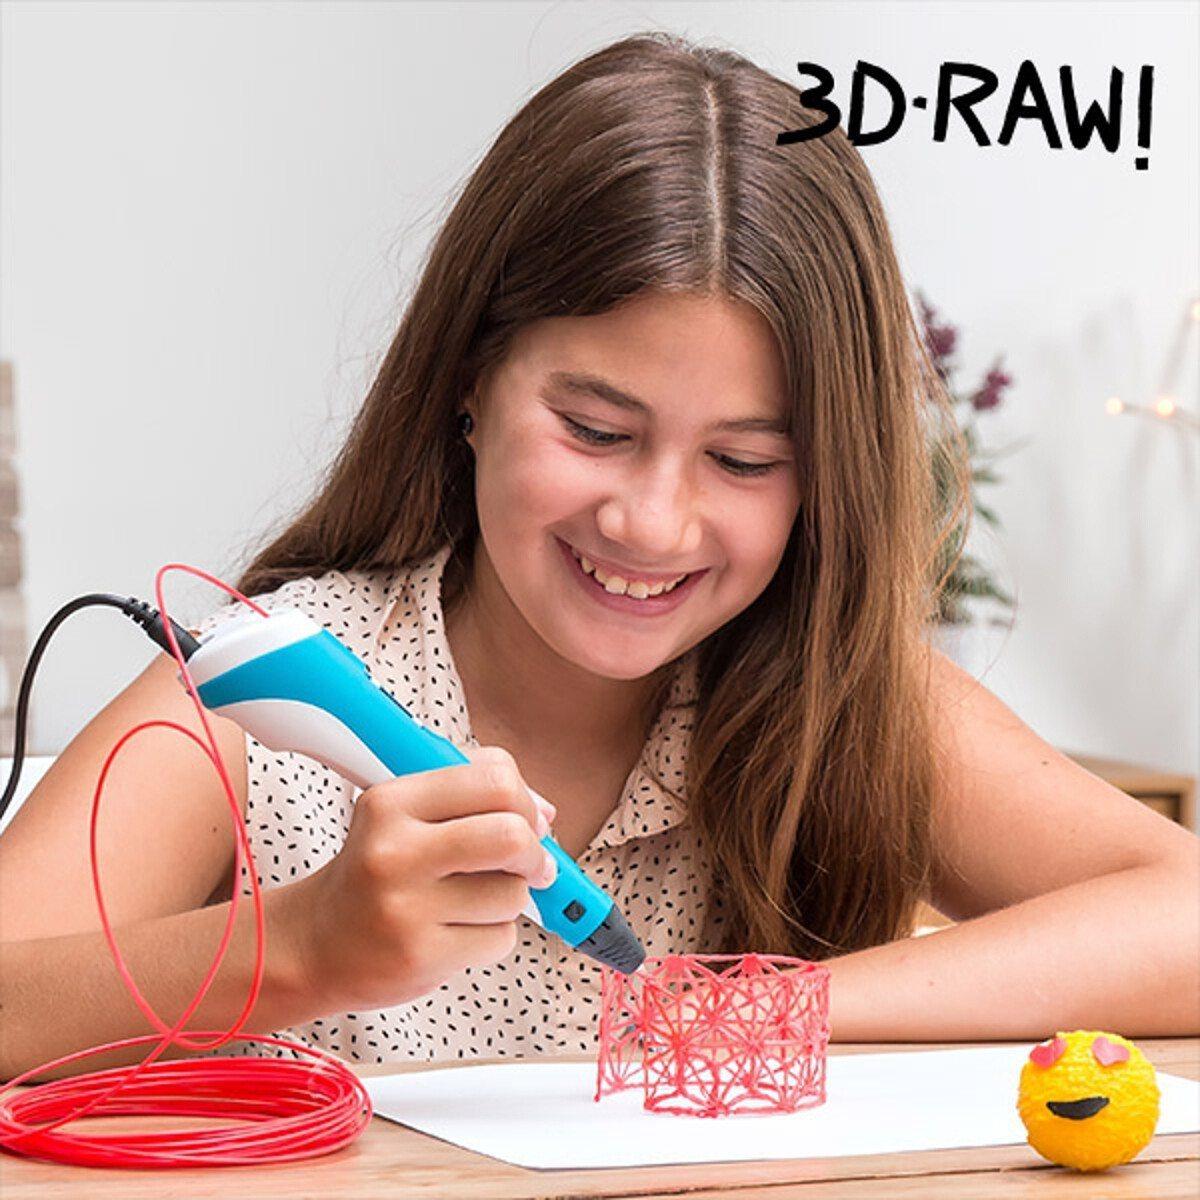 Magischer 3D-Stift - Szene 2